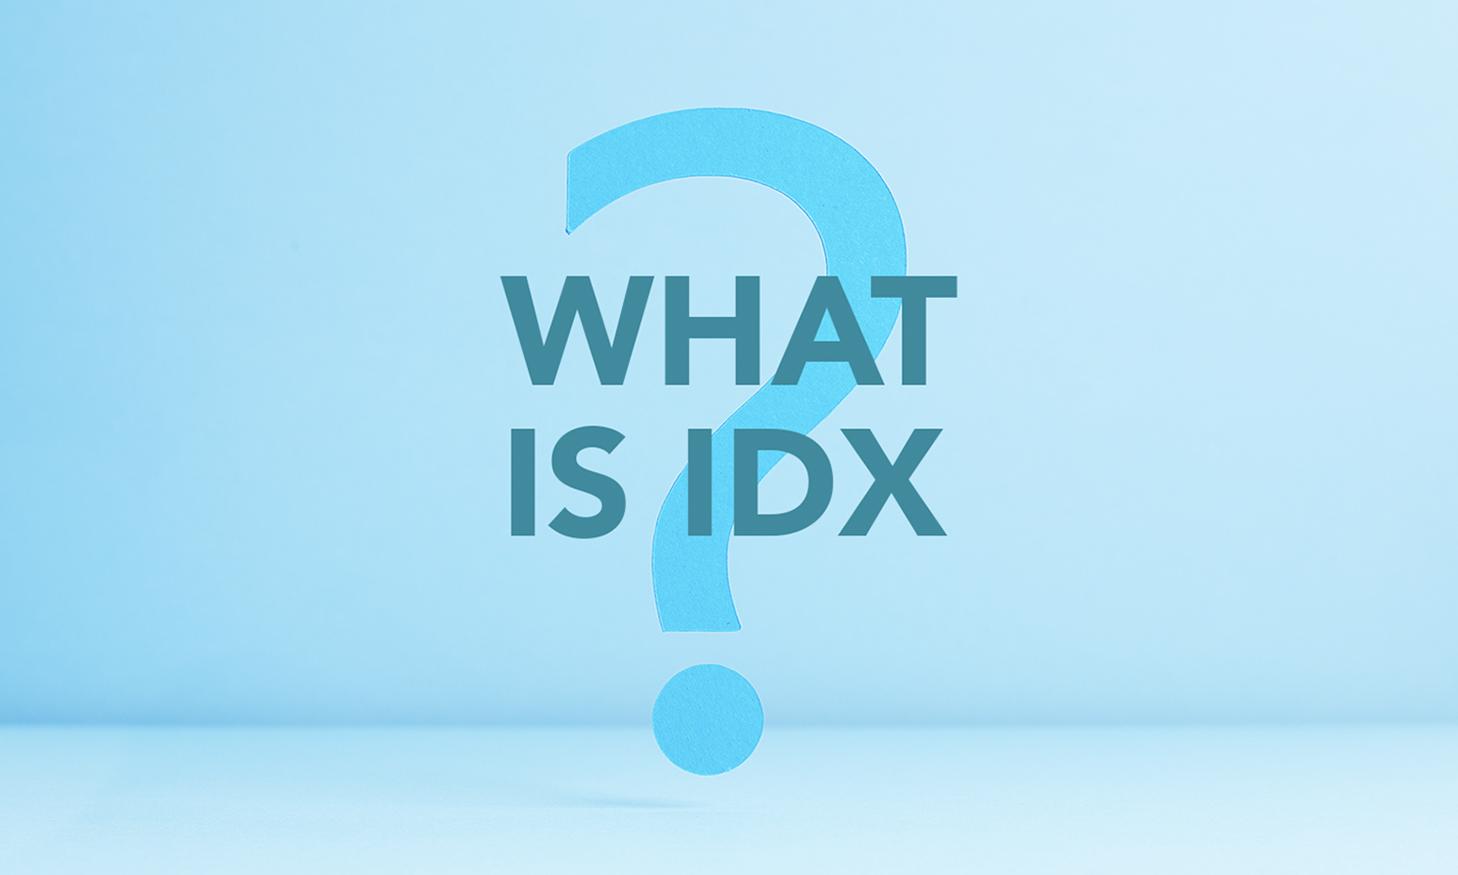 WHAT IS IDX